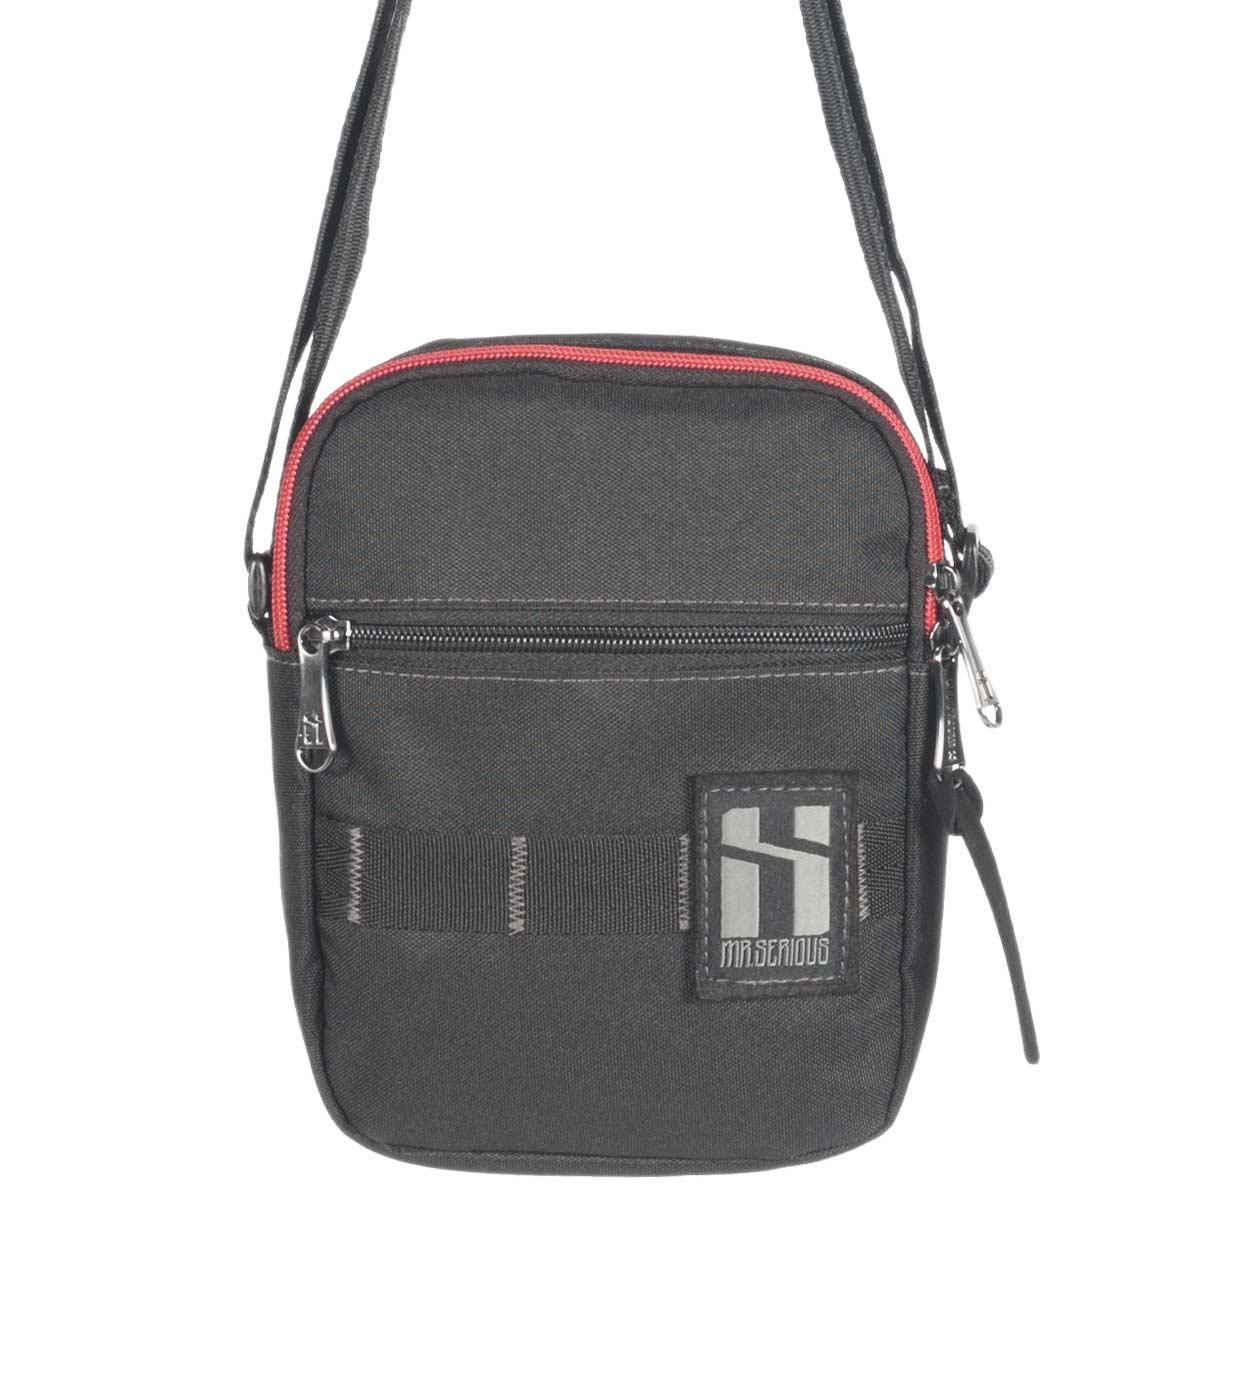 Mr.Serious Platform Pouch Bag